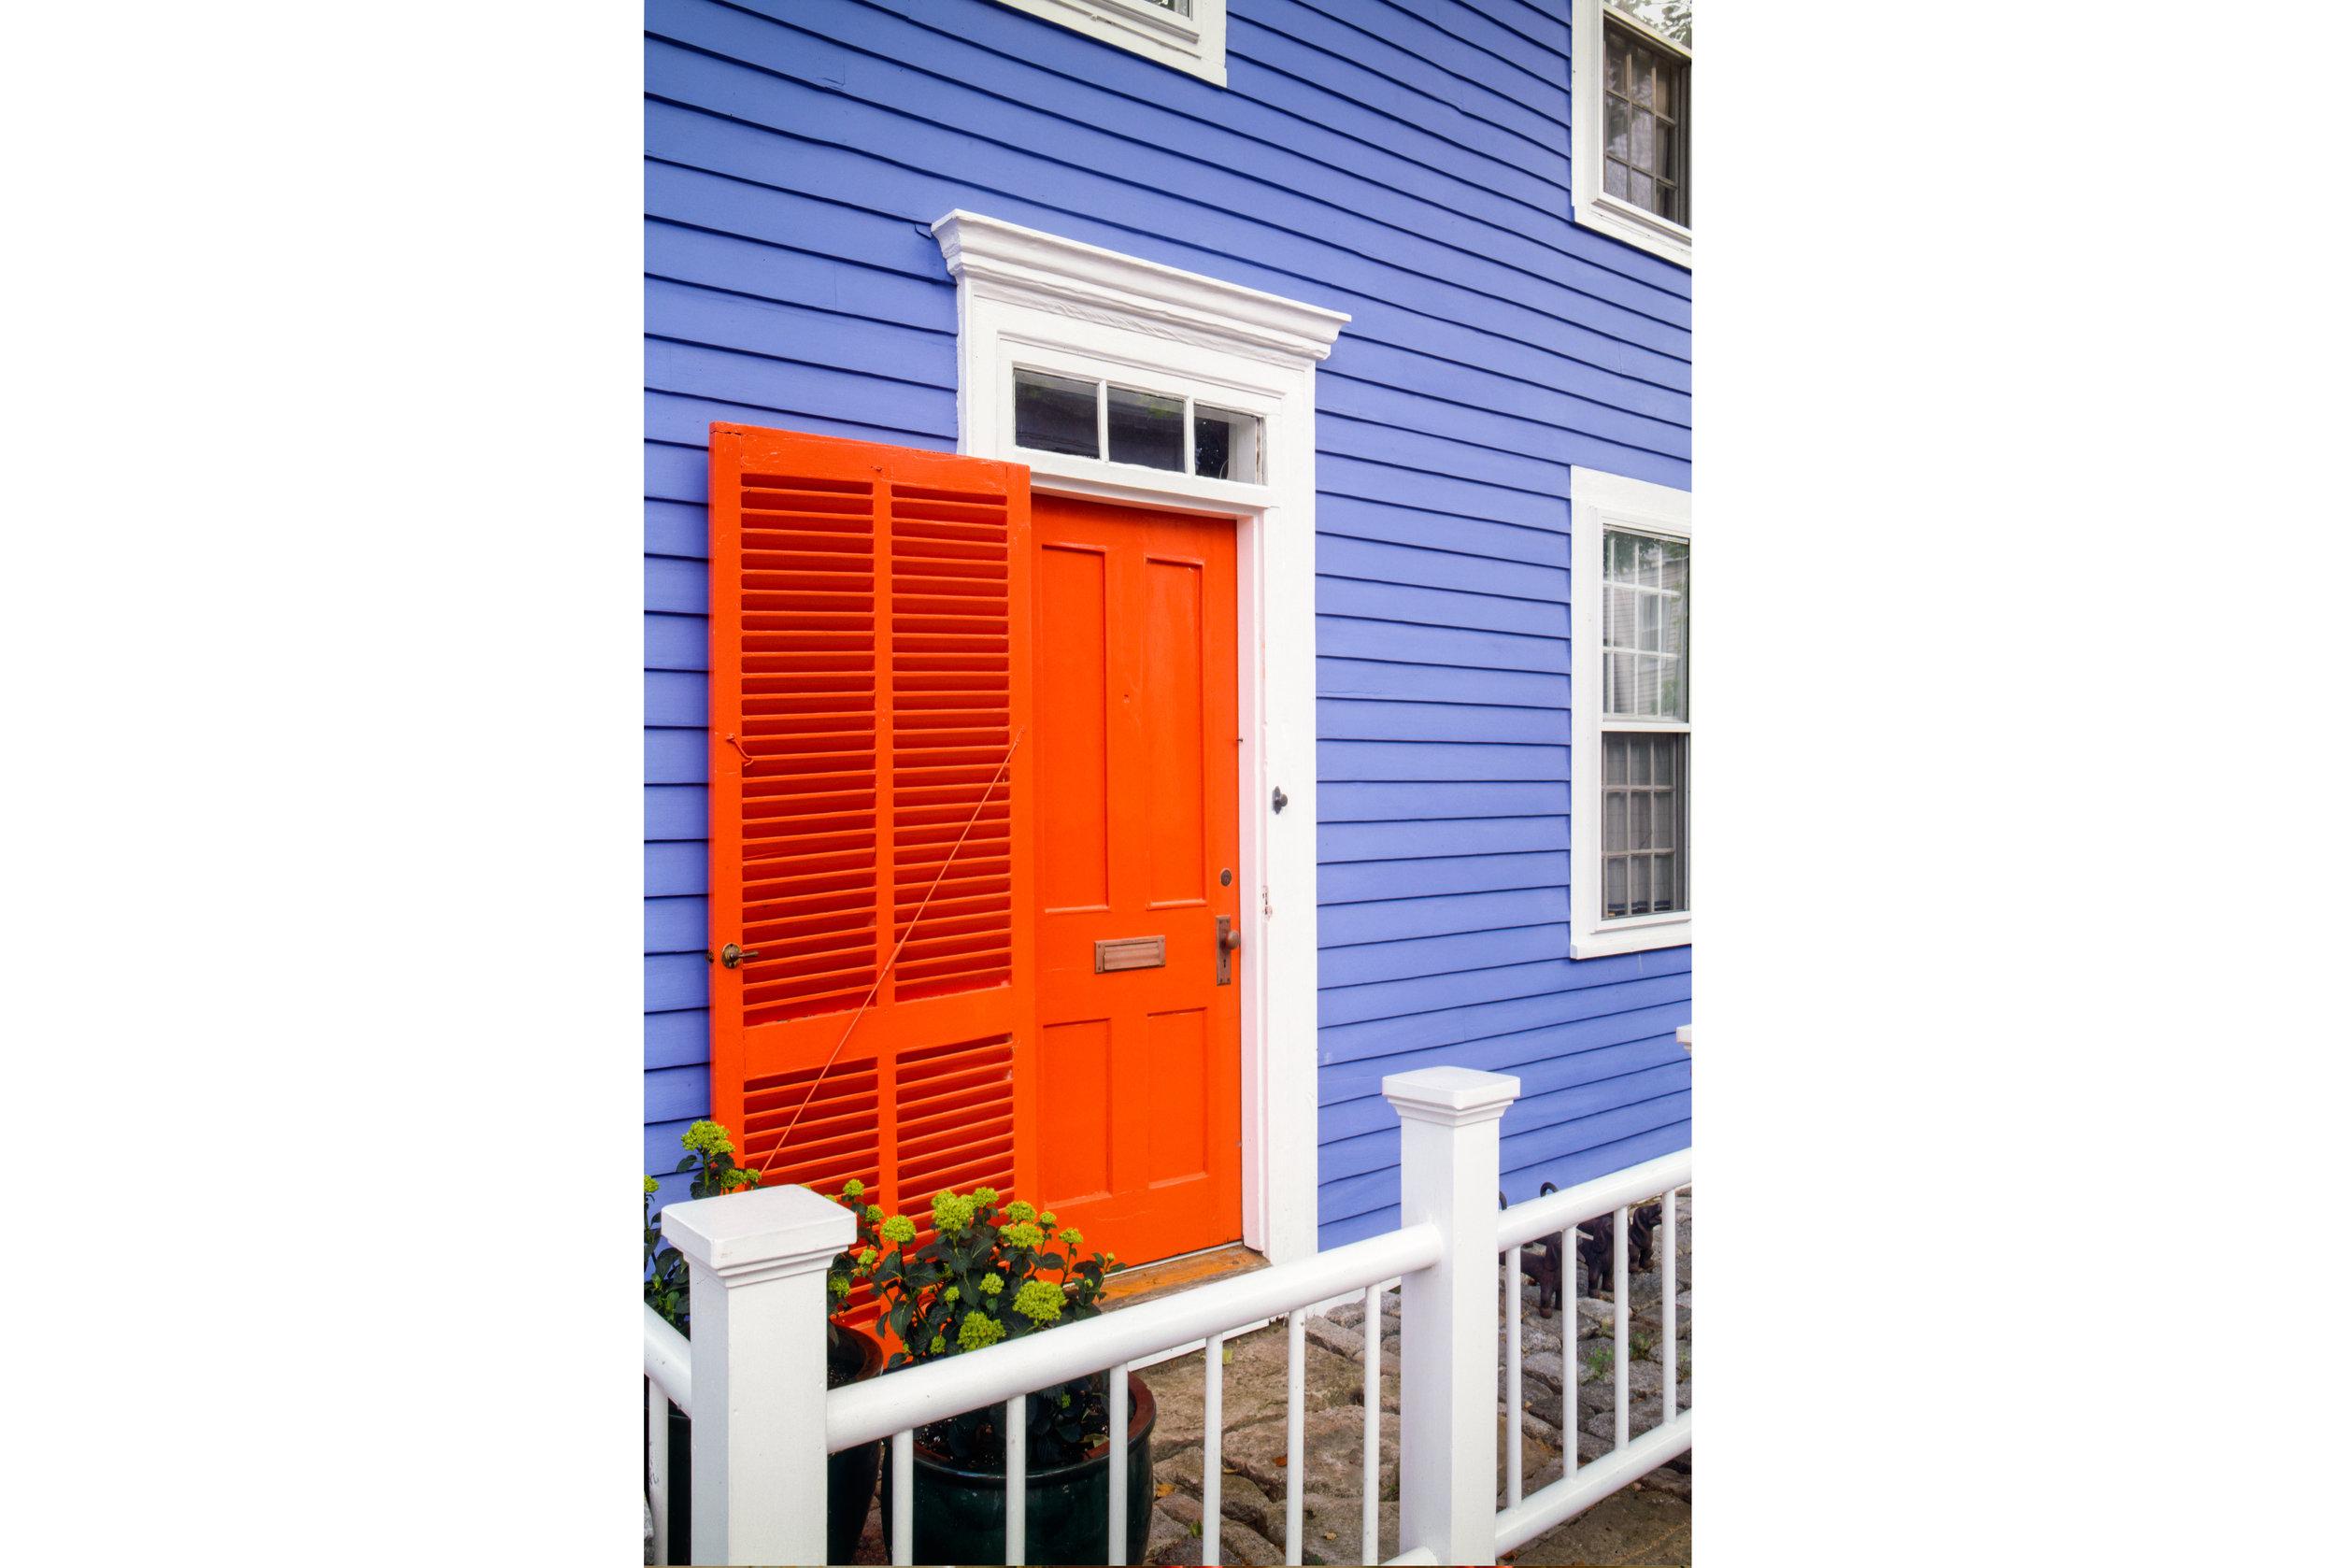 2.Residence-Stonington-CT.jpg